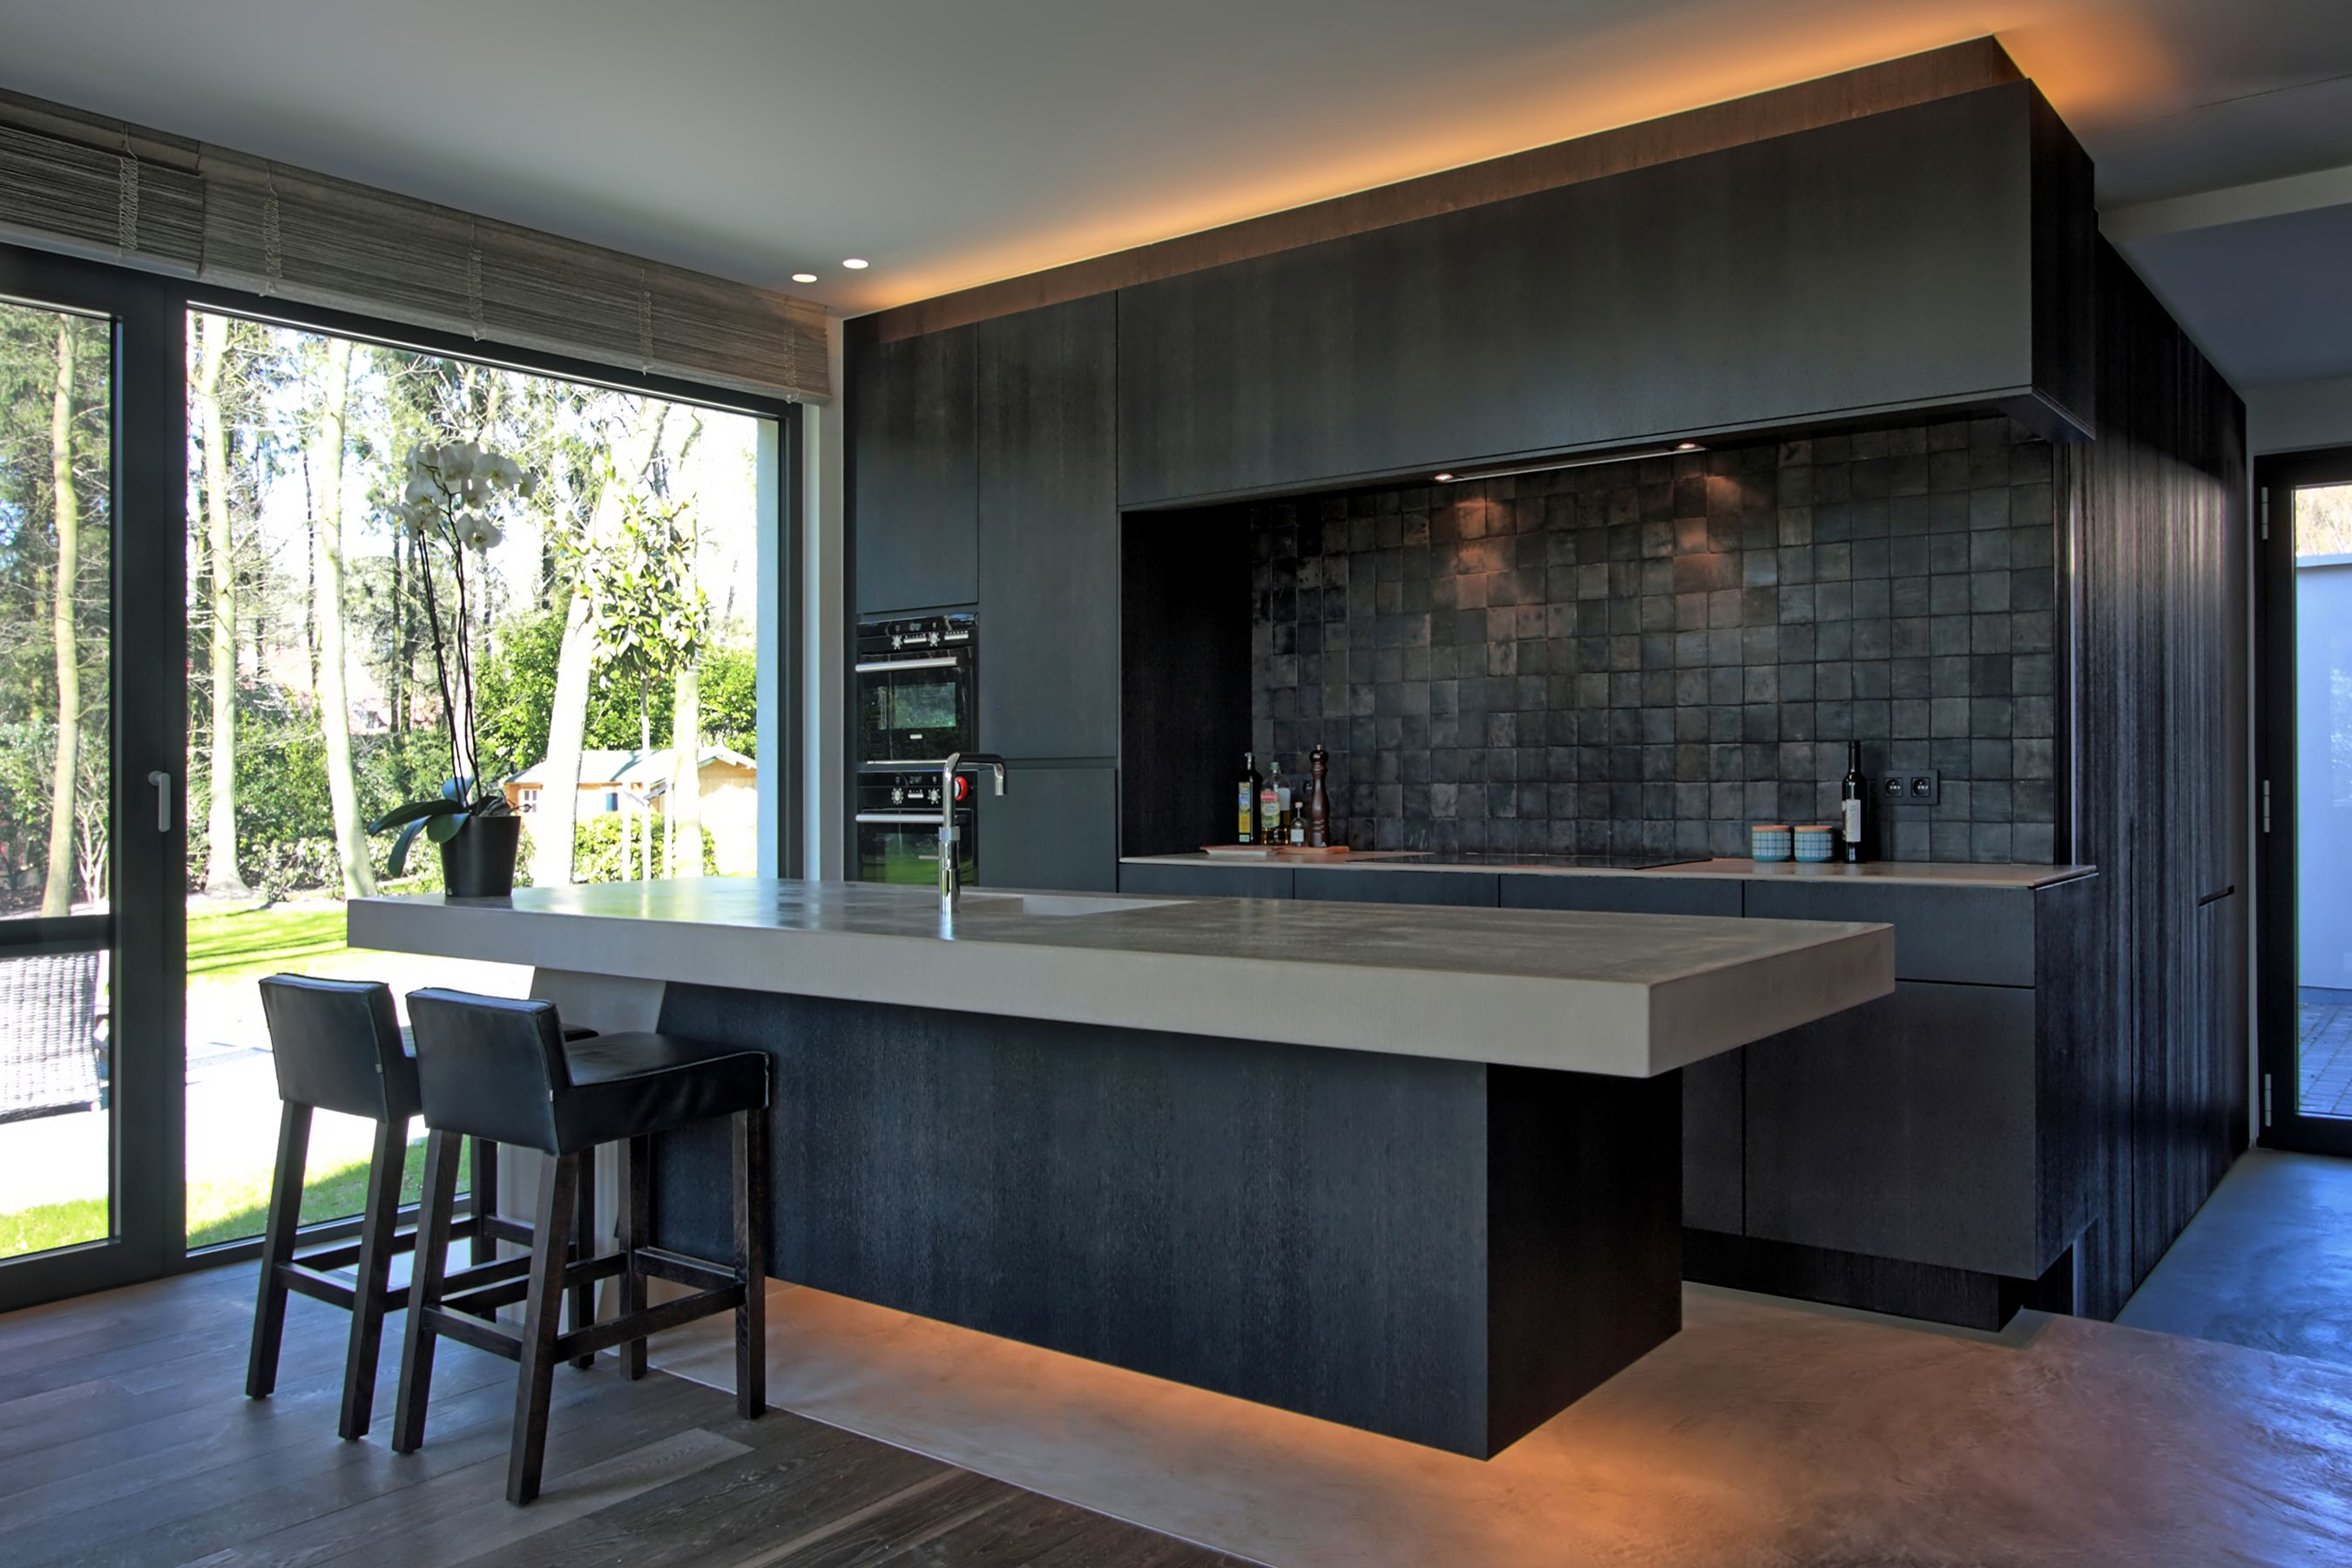 Villabouw Sels Interior Design Kitchen Small Modern Kitchen Design Kitchen Designs Layout